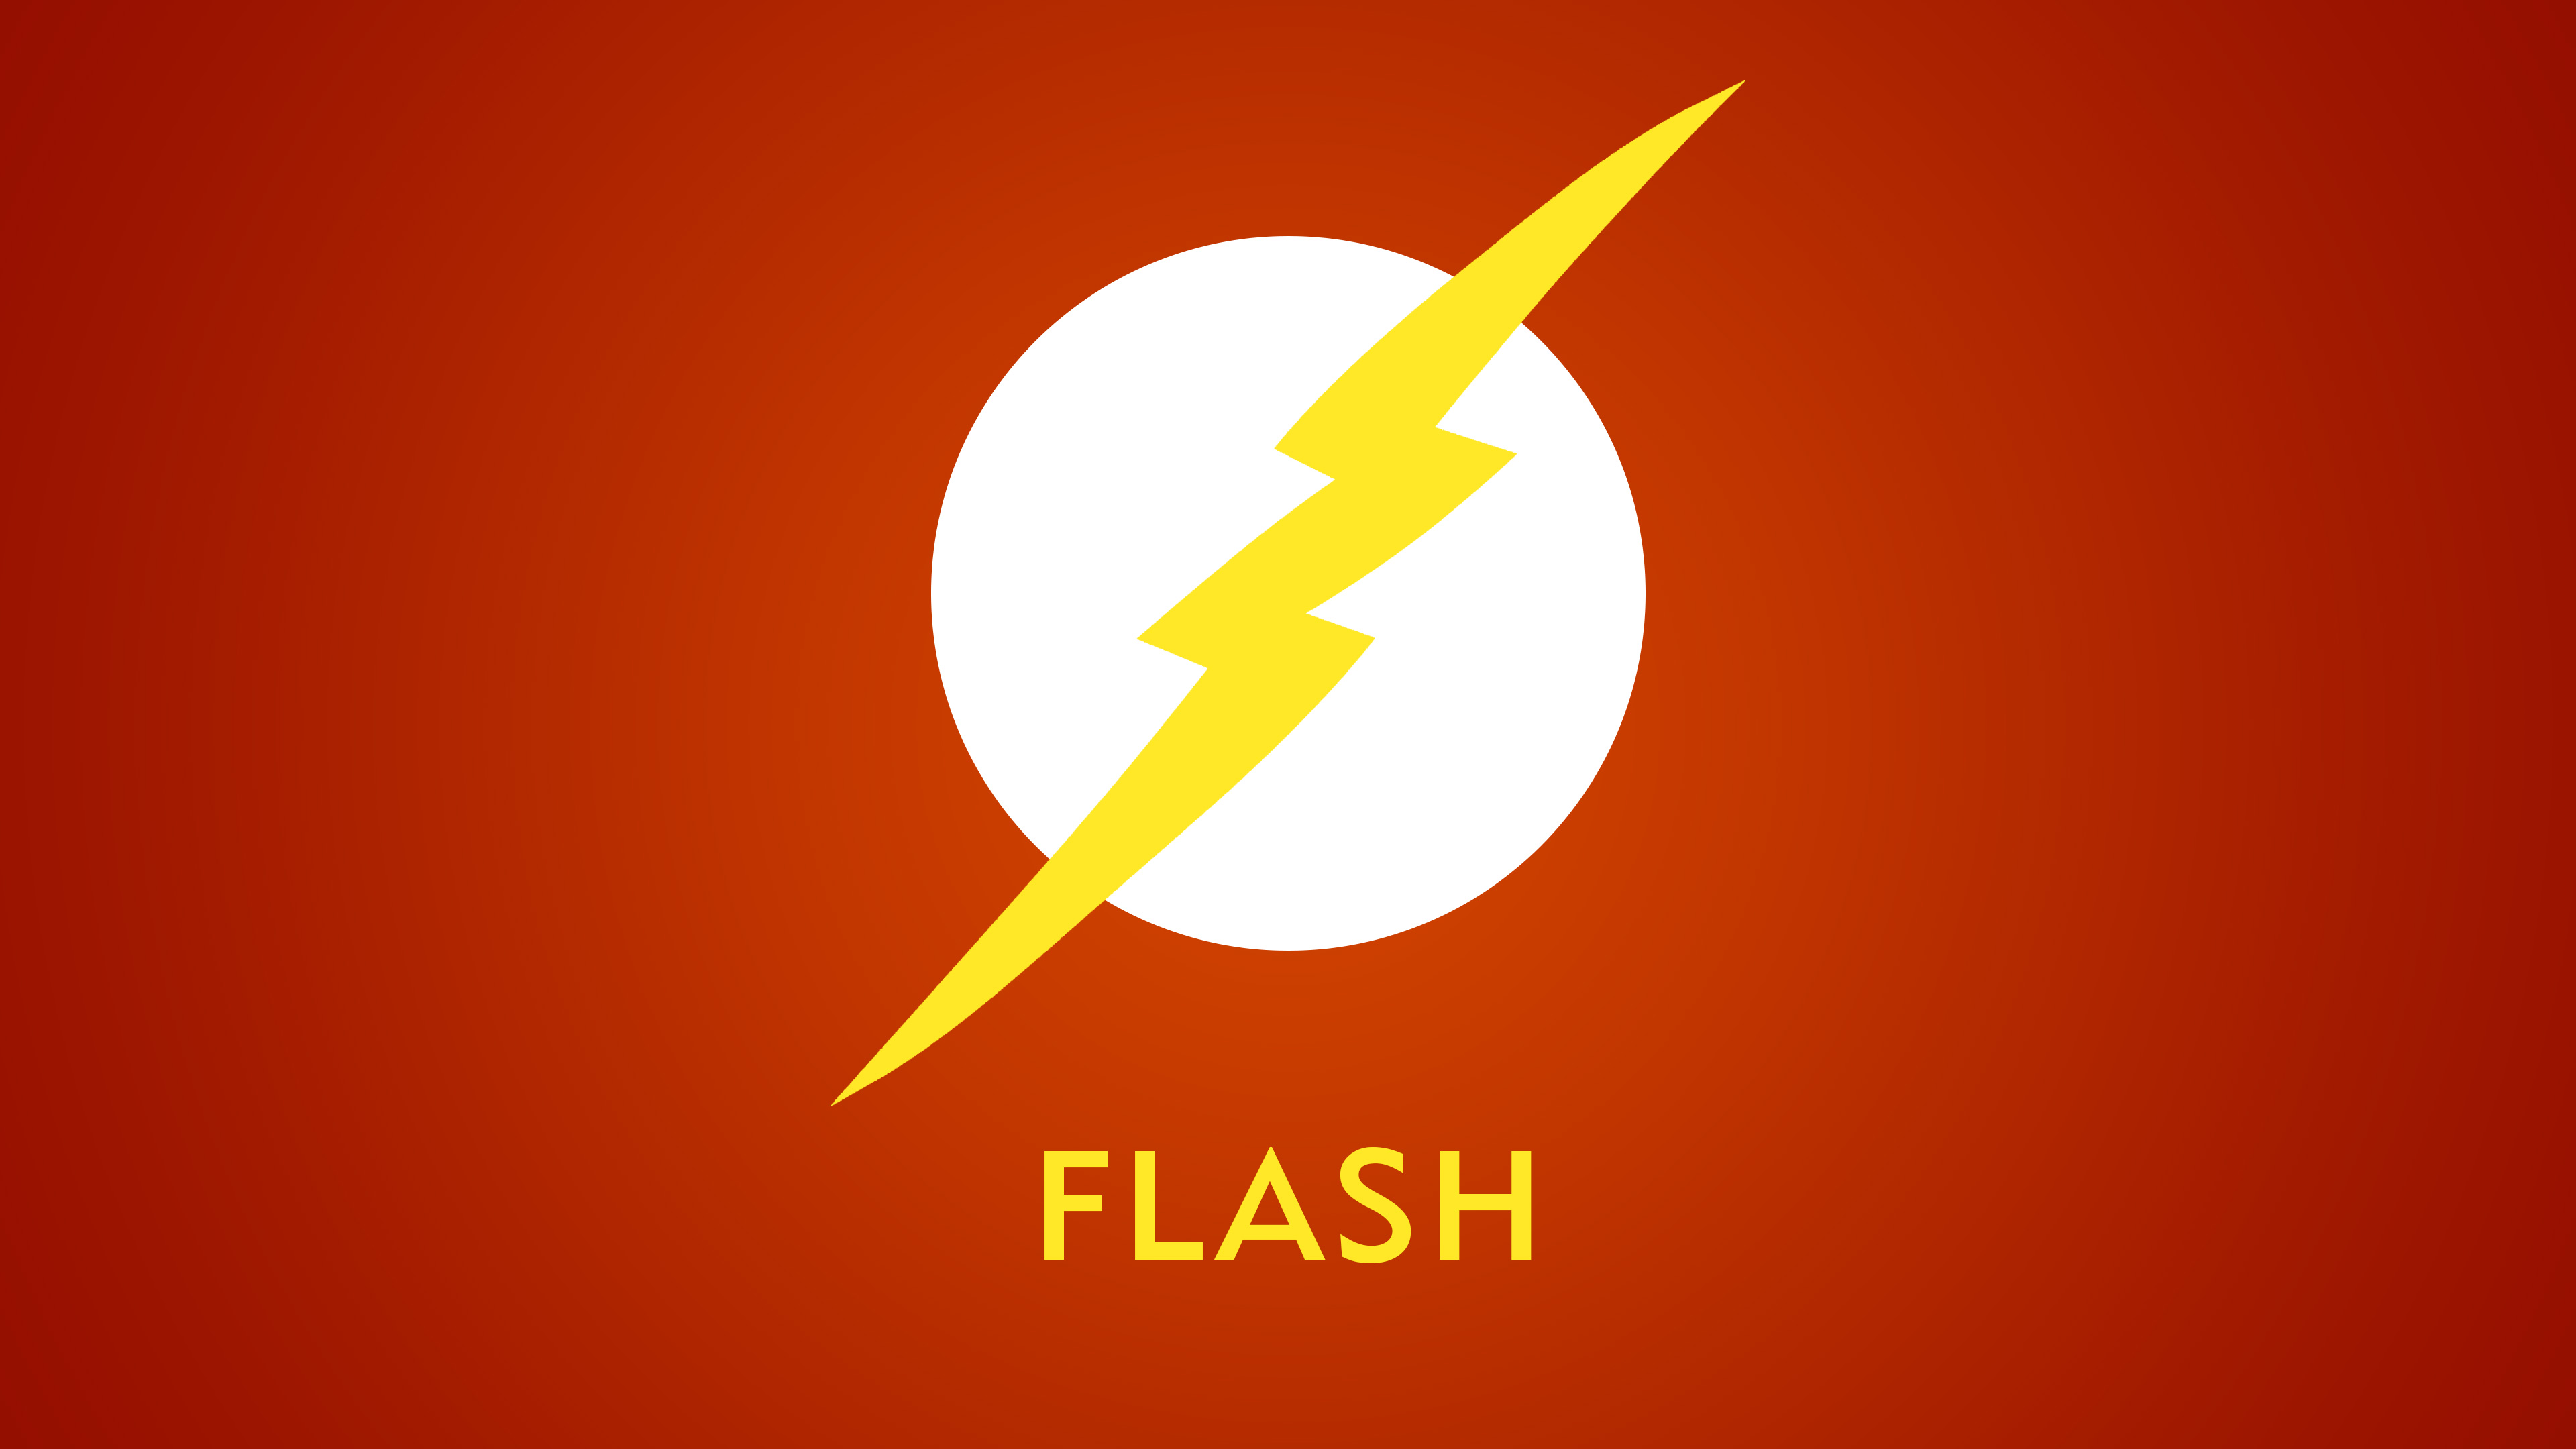 the flash 4k logo 1536524078 - The Flash 4k Logo - the flash wallpapers, superheroes wallpapers, logo wallpapers, hd-wallpapers, 4k-wallpapers